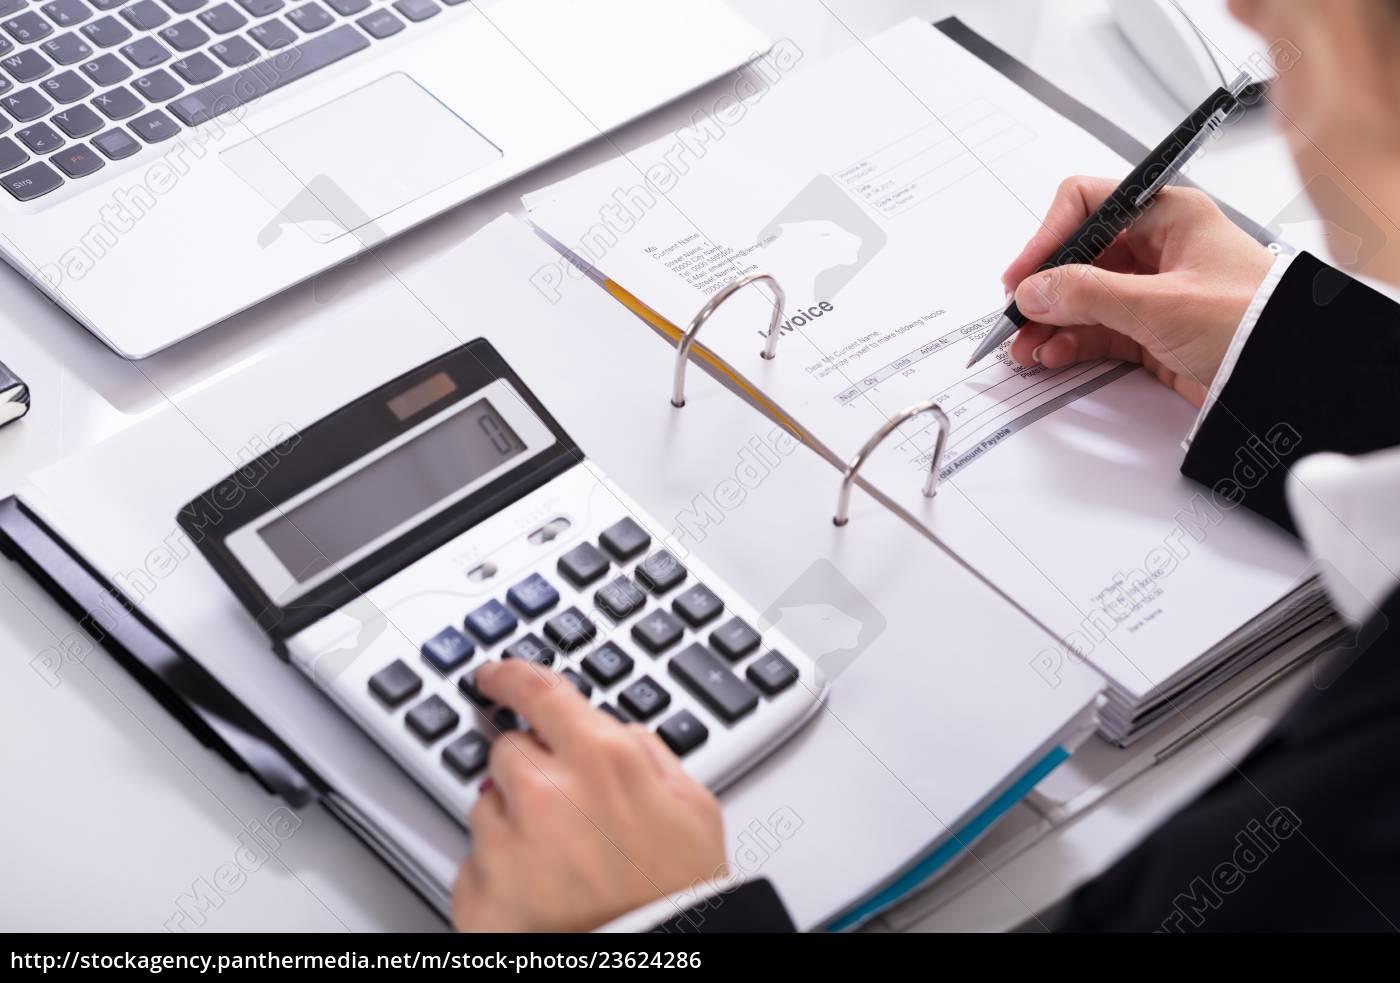 businesswoman, hand, calculating, invoice, using, calculator - 23624286